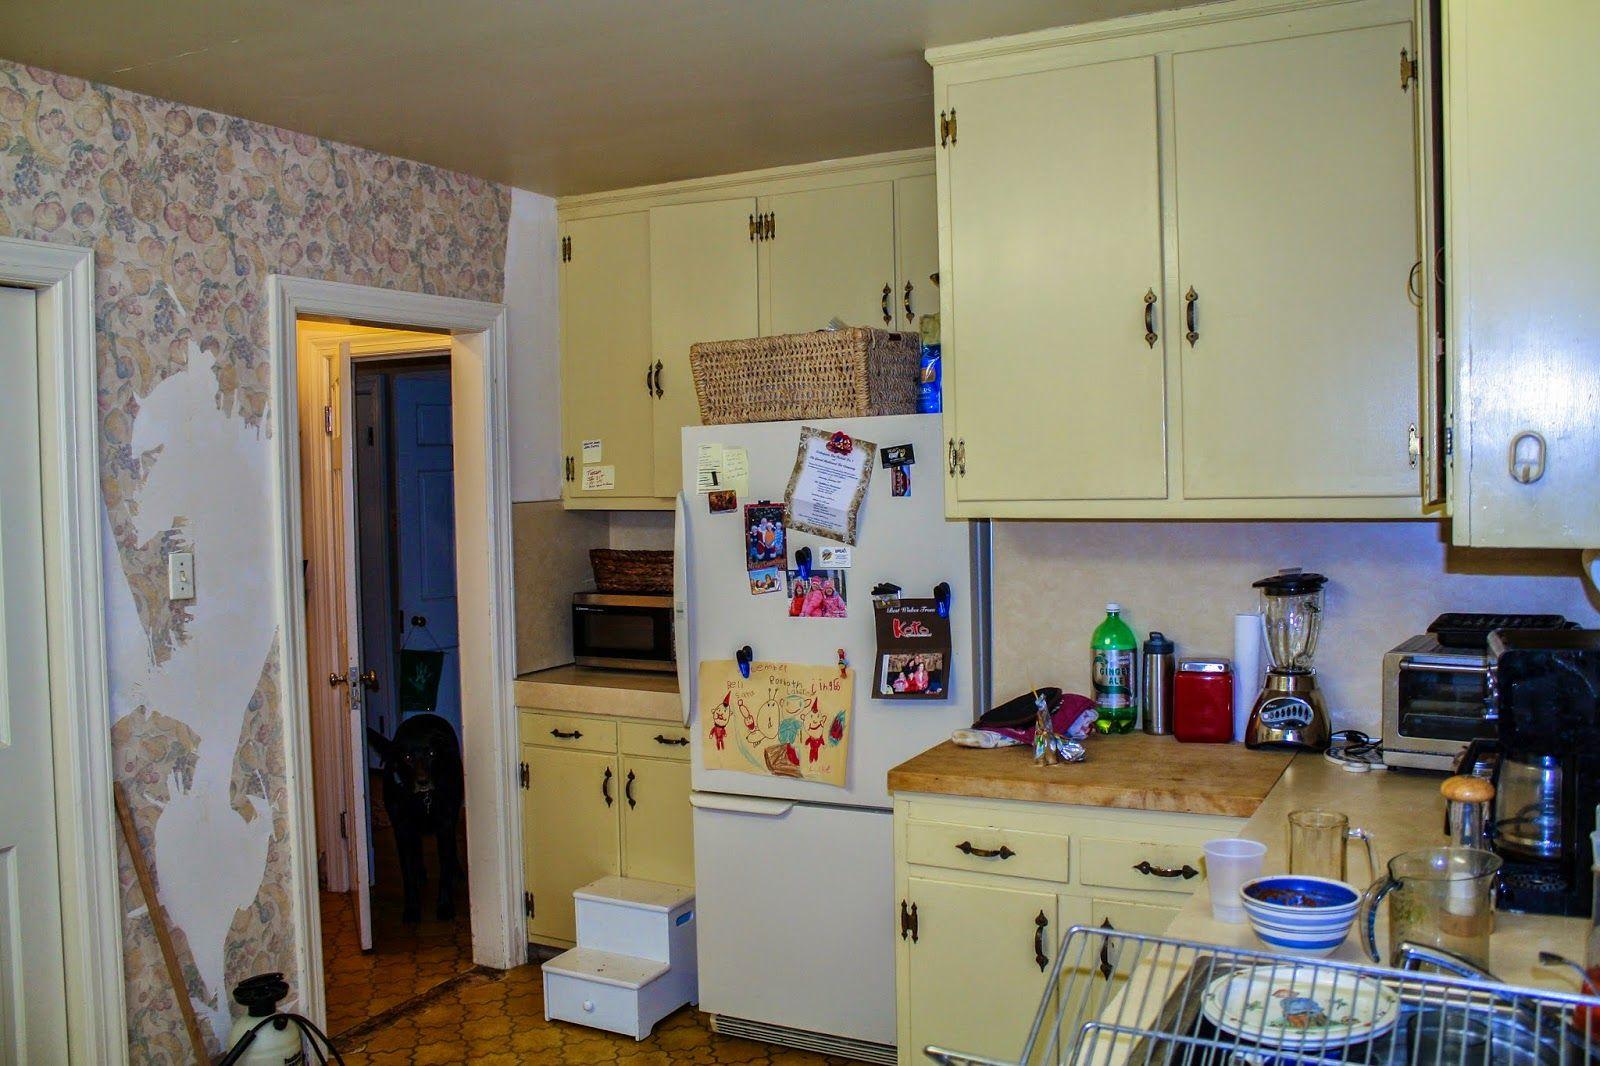 Kitchen Renovation - Refacing Kitchen Cabinets - New Hardware ...